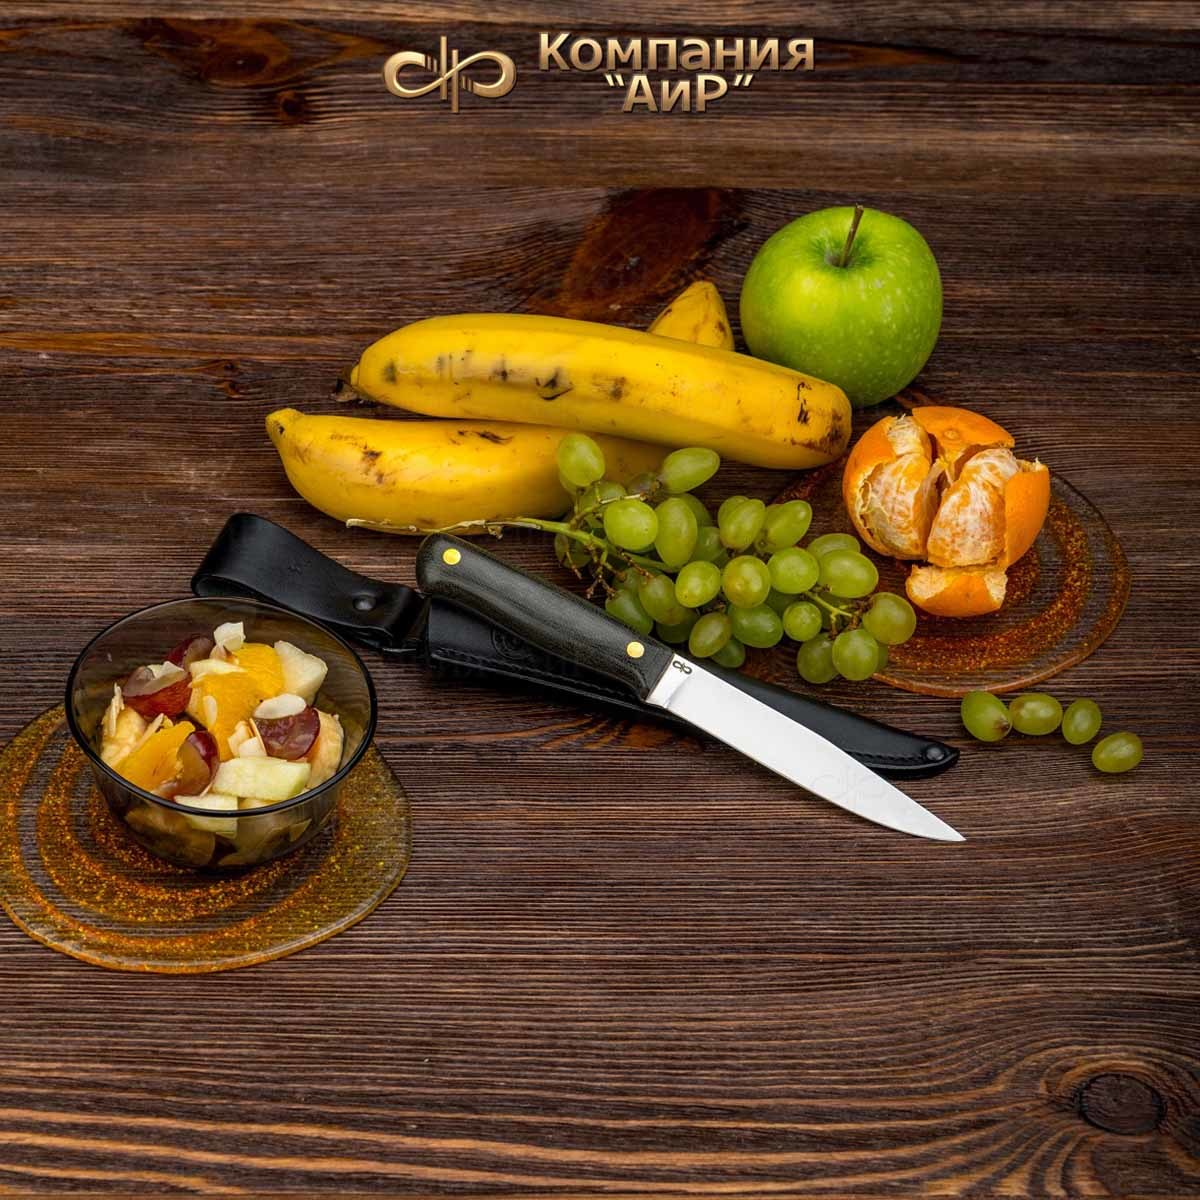 Нож разделочный АиР Заноза ЦМ, сталь 100х13м, рукоять текстолит